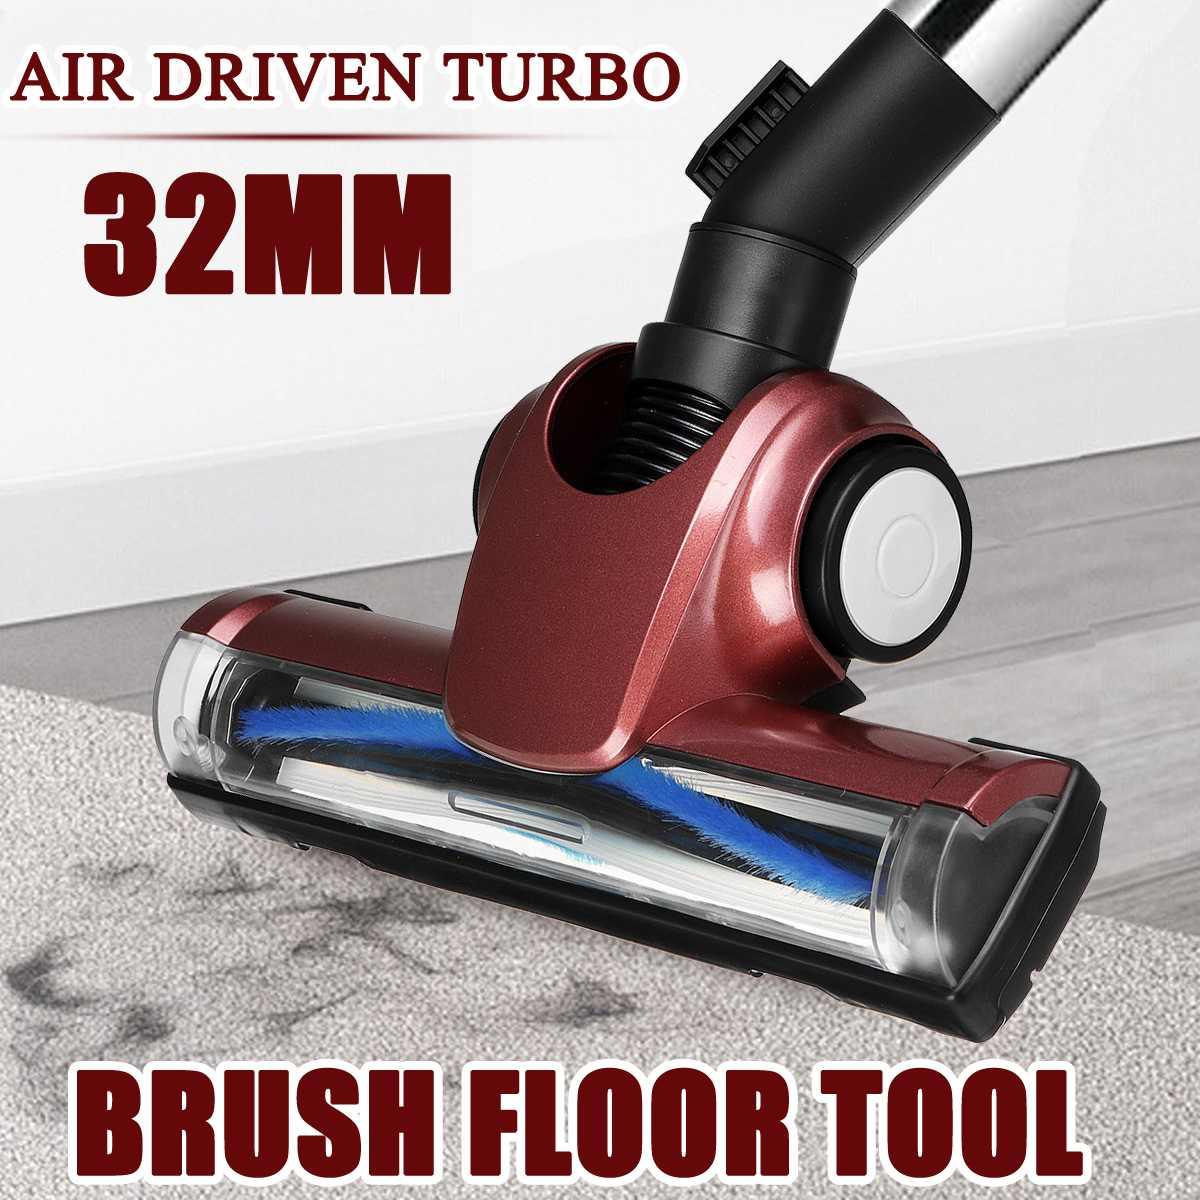 Hot Sale Vacuum Cleaner Accessories Flexible Anti-static Transparent Furniture Tips For Dyson V6 Dc62 Dc52 Dc59 Home Appliances